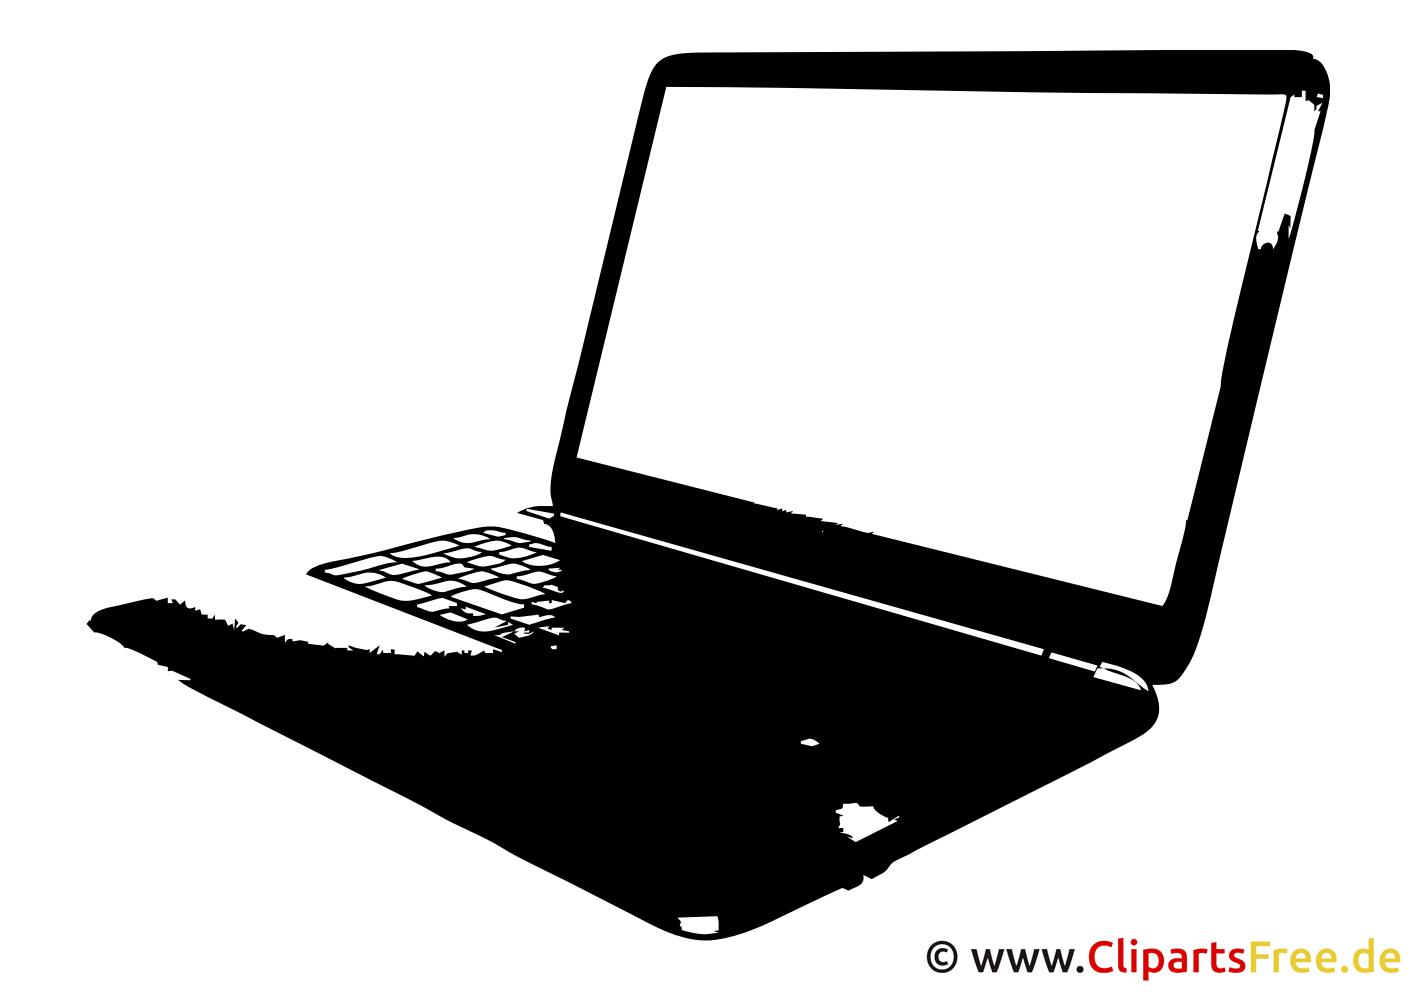 Clipart Laptop Vektor-SVG